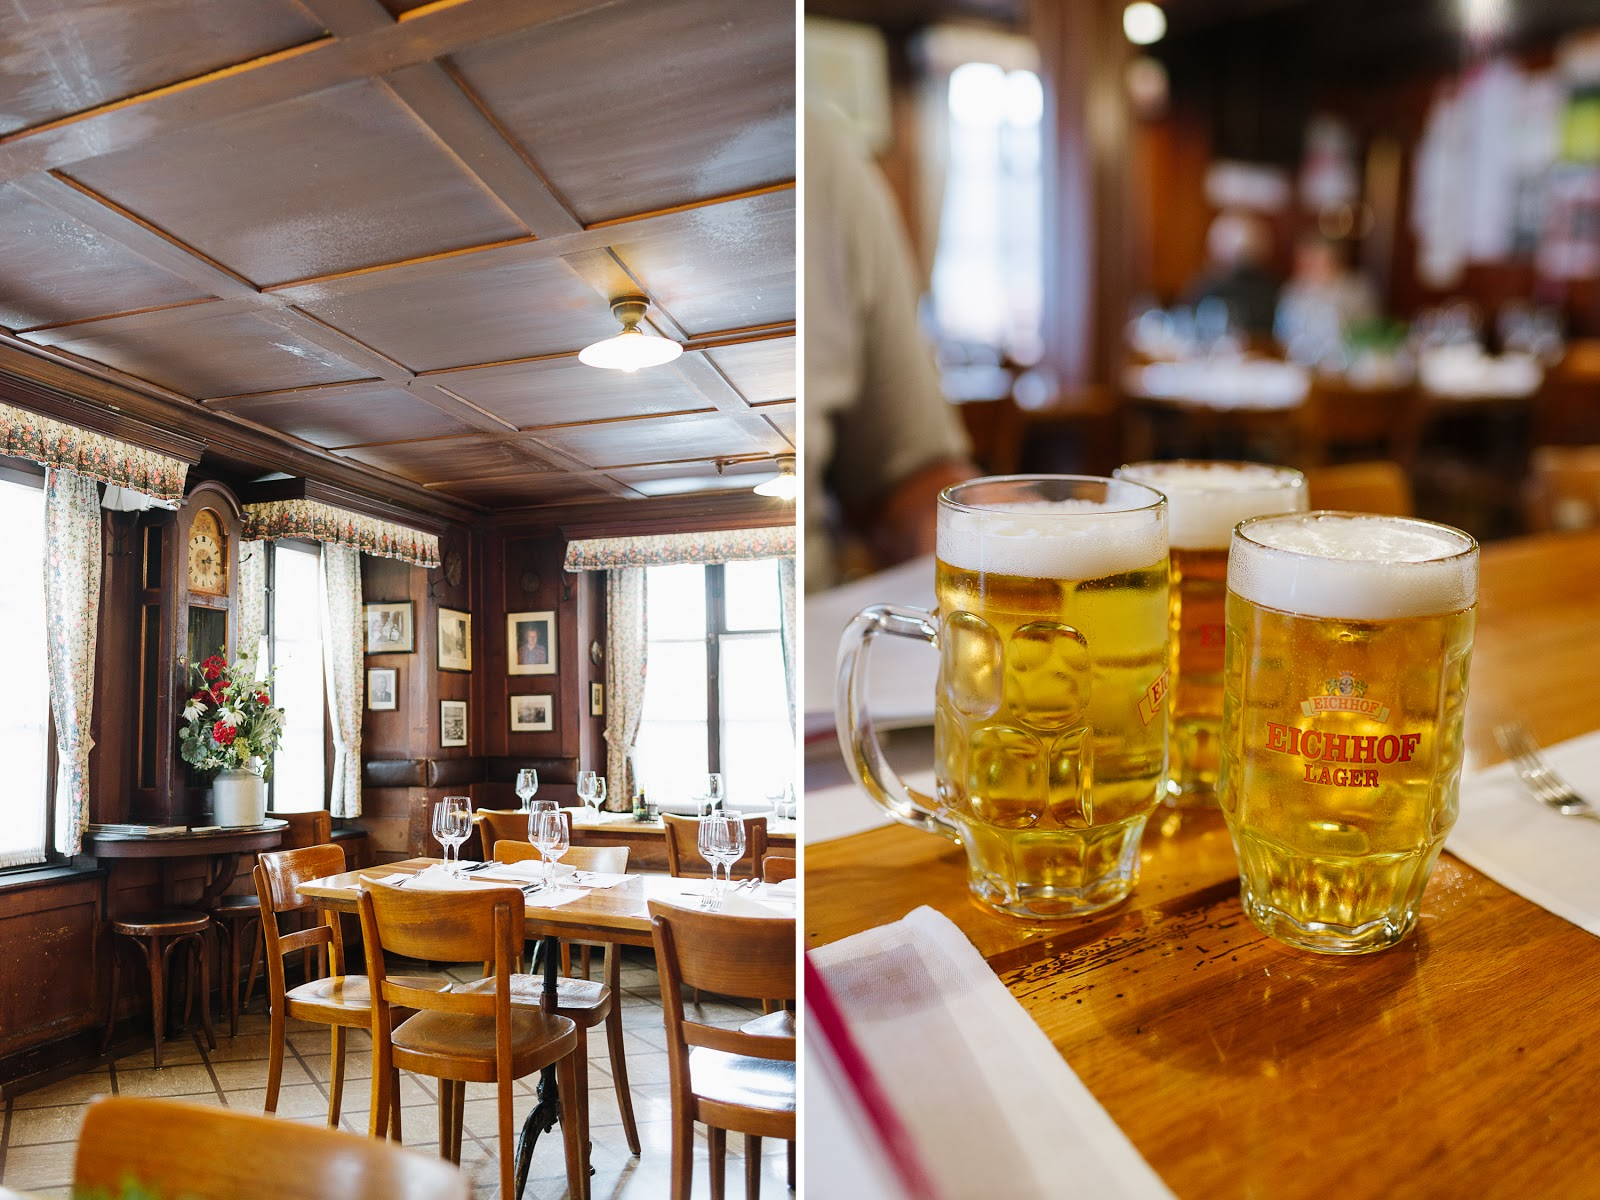 Beautyosaurus Lex-Alex Good-Lifestyle-Travel-TravelBloggers-Lbloggers-Lucerne-Switzerland-Beer-Summer-lion of Lucerne-chapel bridge-Kapellbrücke-Wirtshaus Galliker-Reuss River-Luzern-Lucerne Travel Guide